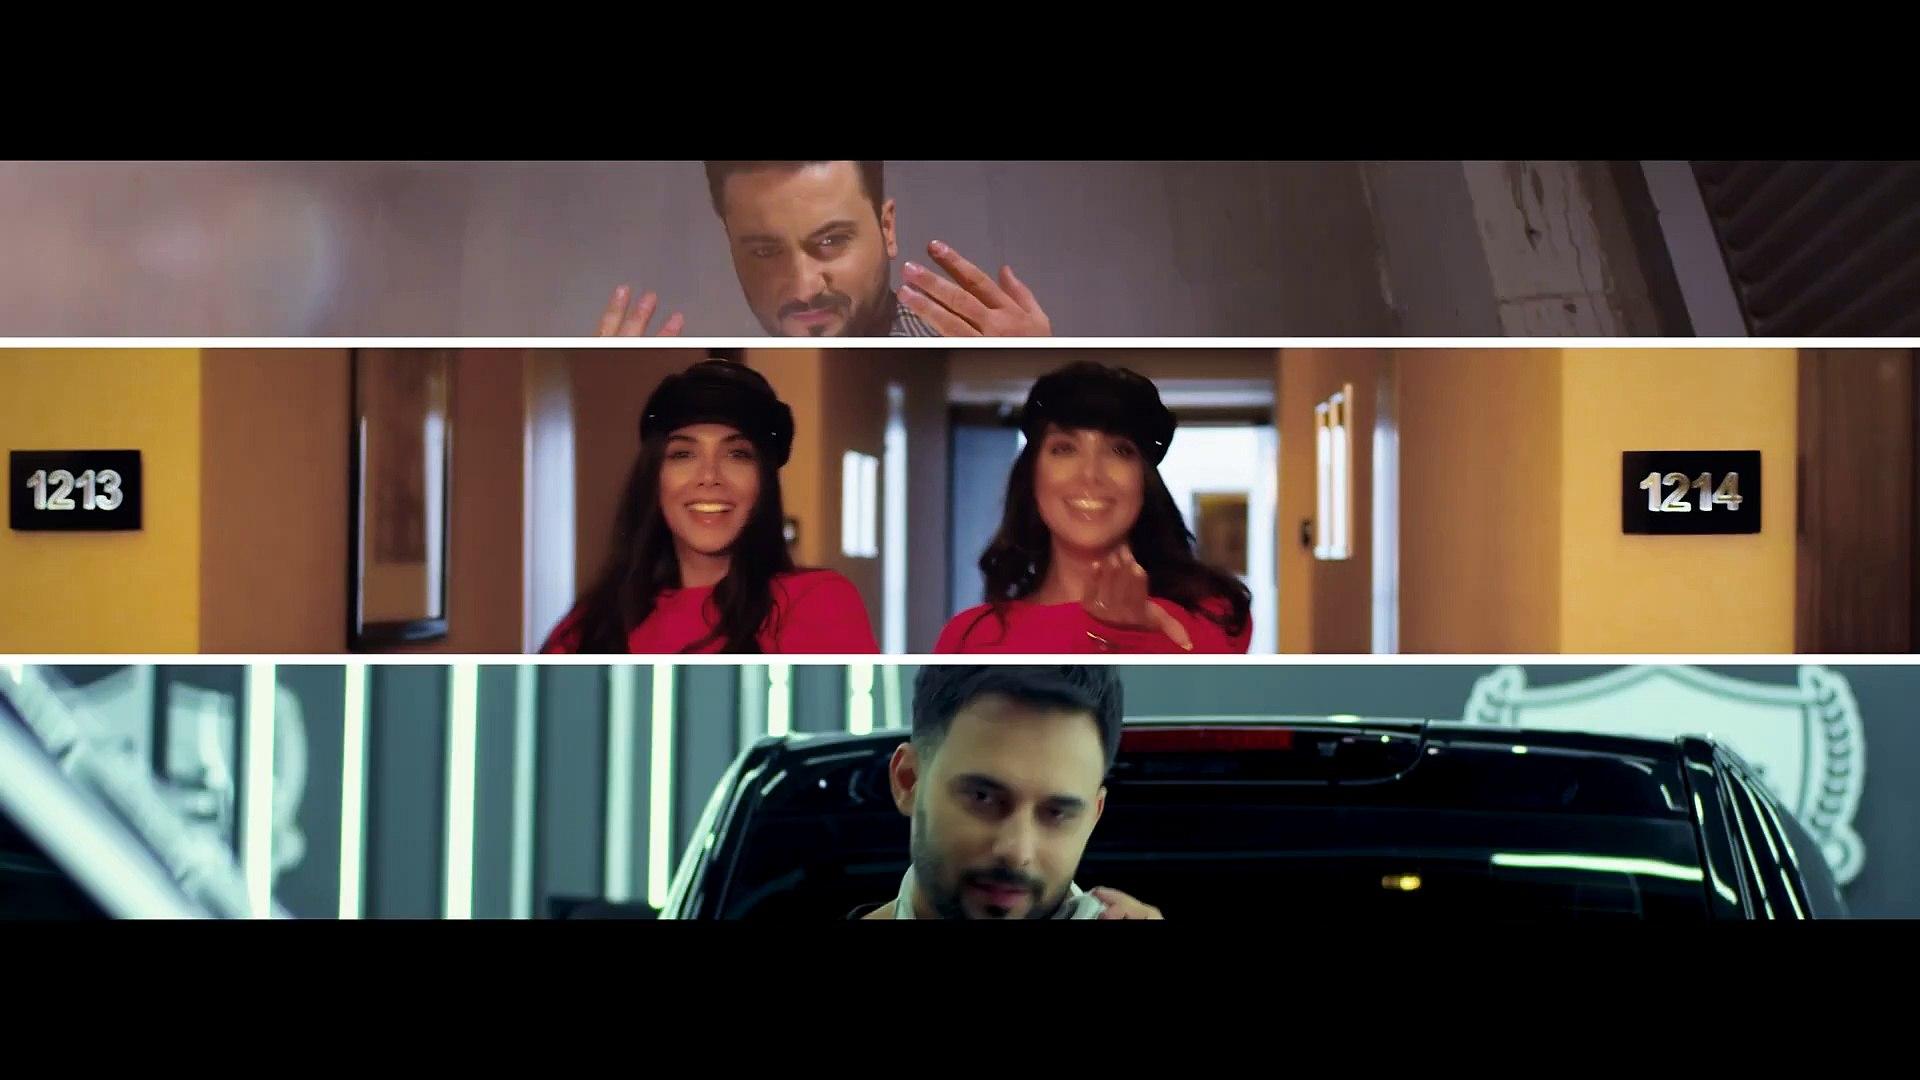 Dj Roshka Sevil Sevinc Ozan Kocer Mashup 4 Dailymotion Video